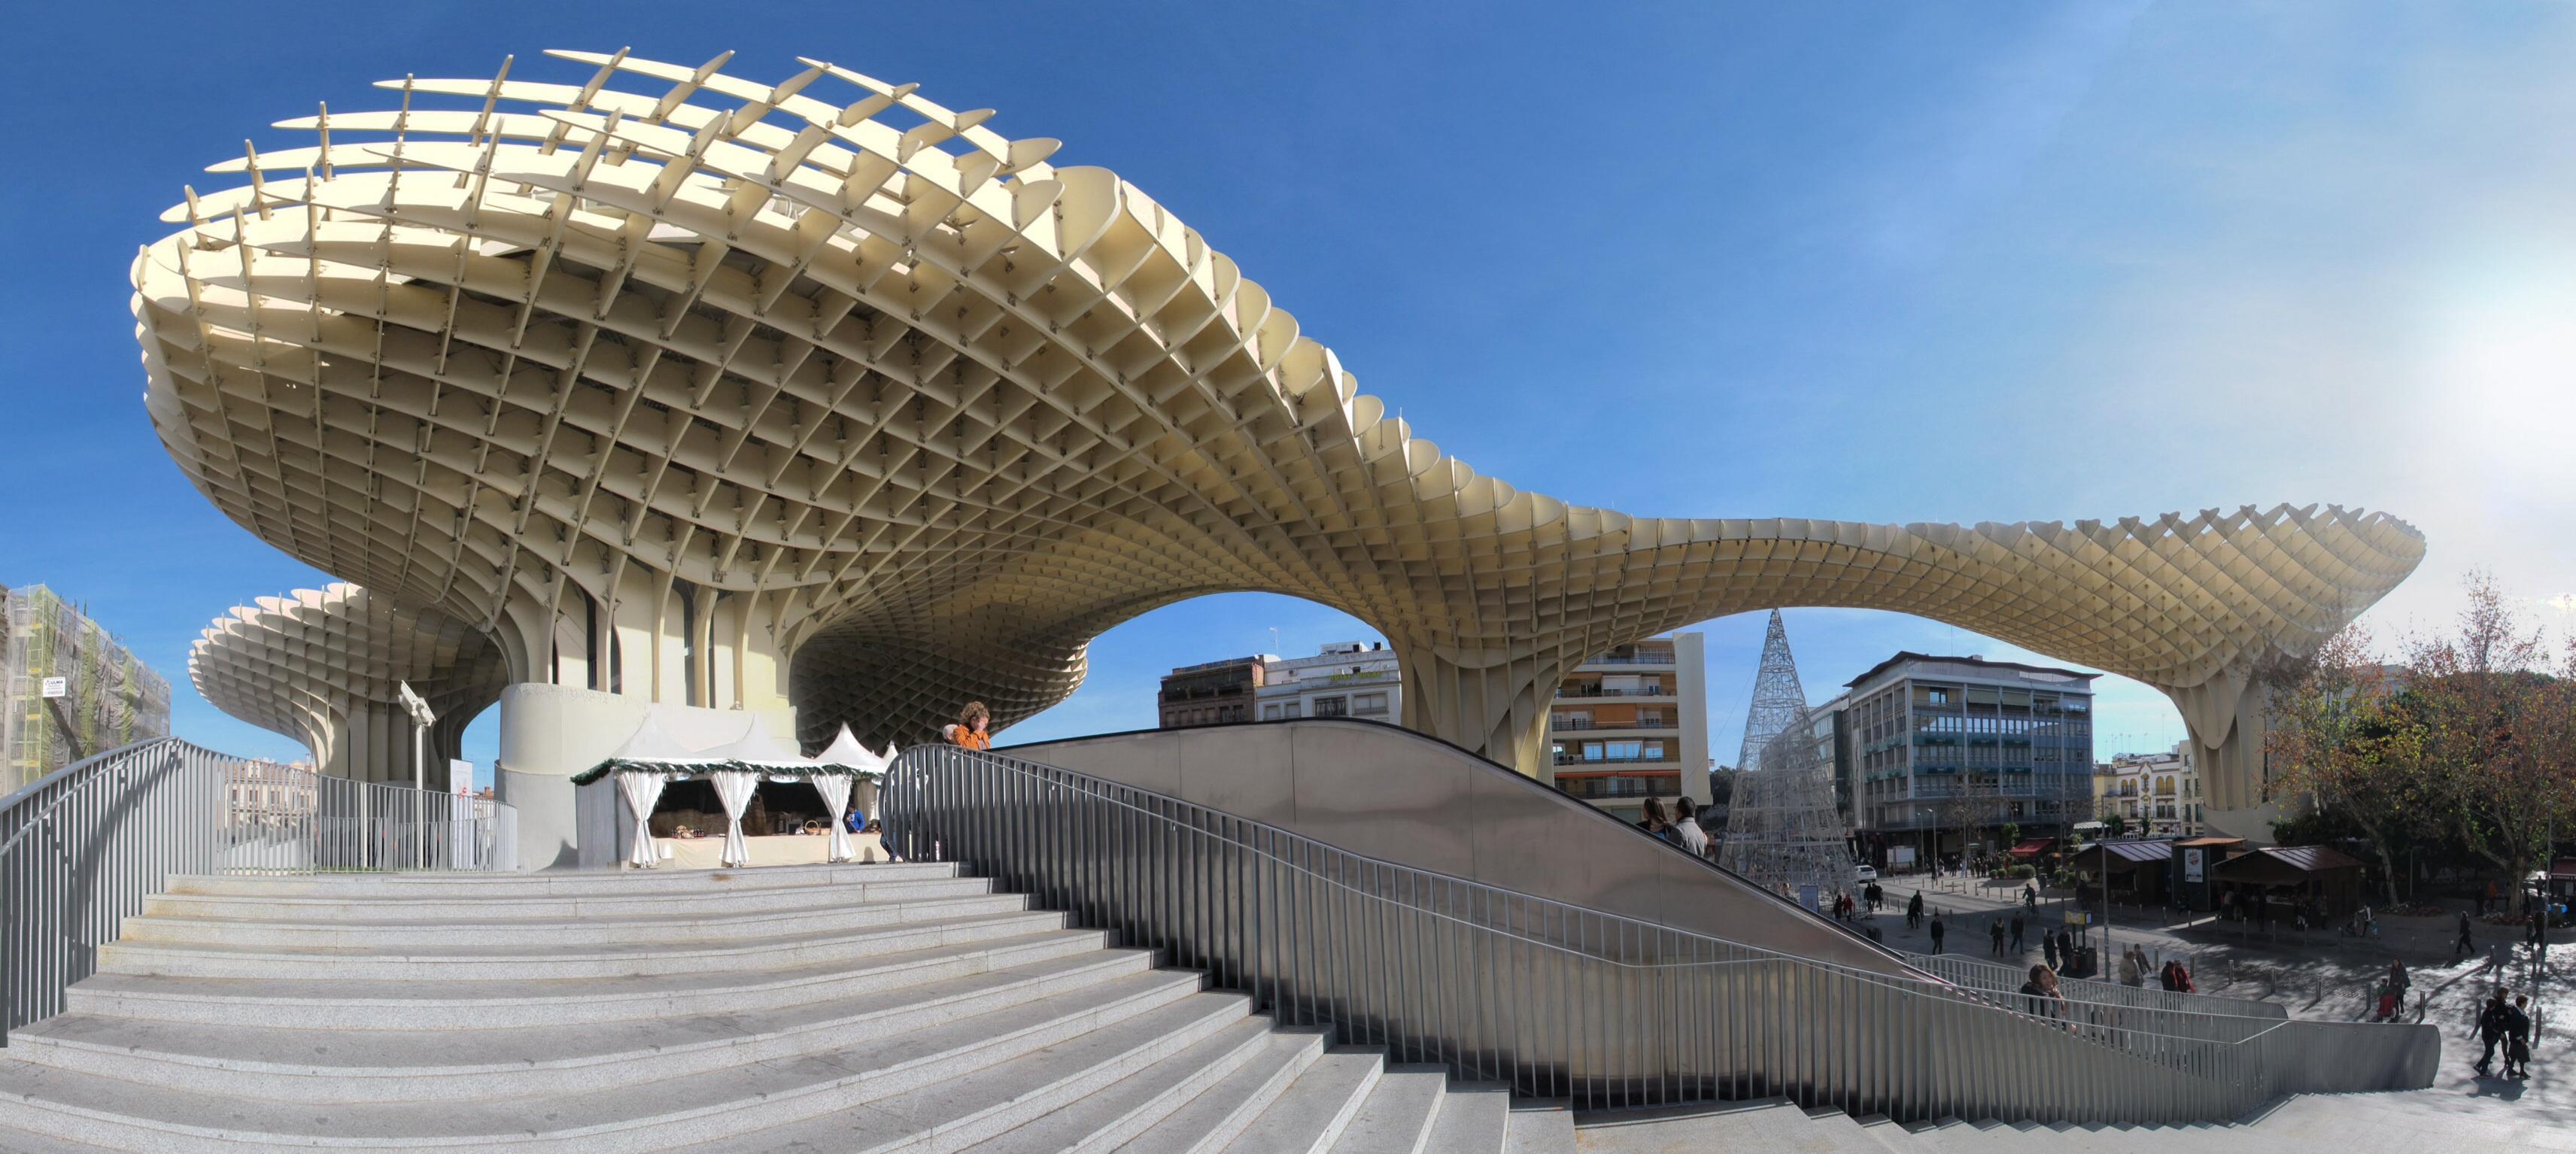 Sevilla, 2014, Metropol Parasol